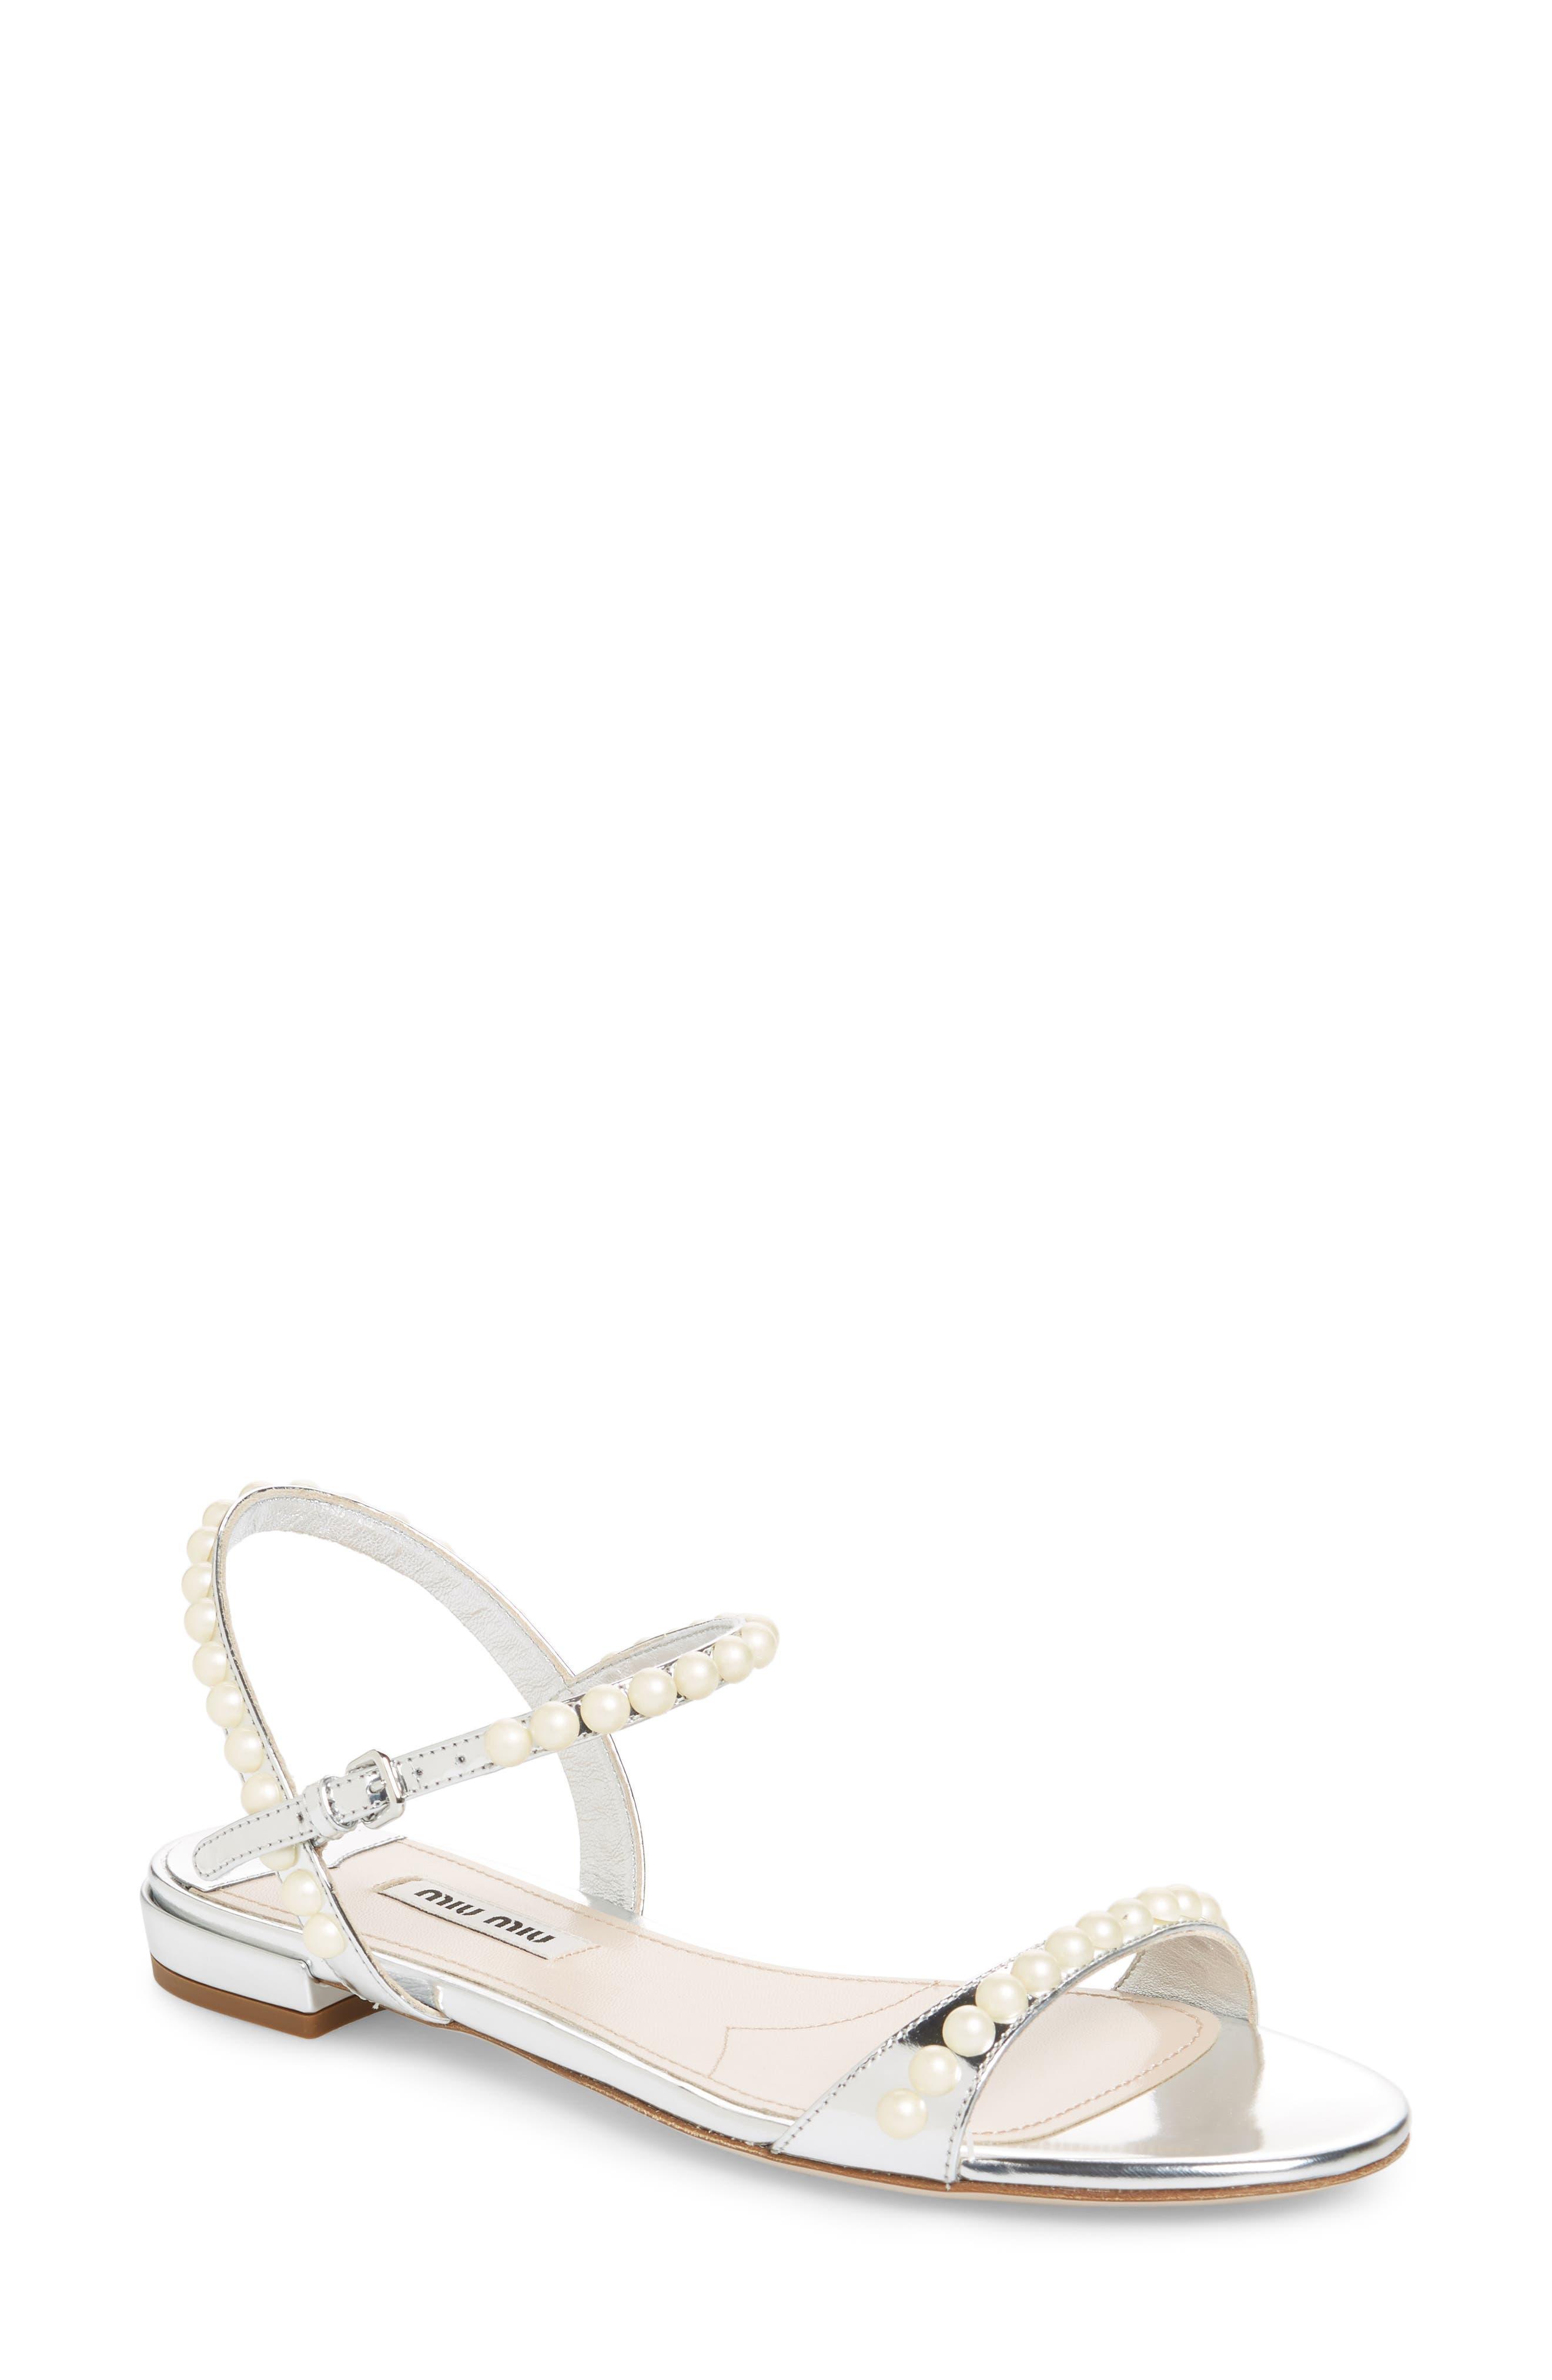 Pearl Sandal,                         Main,                         color, Silver